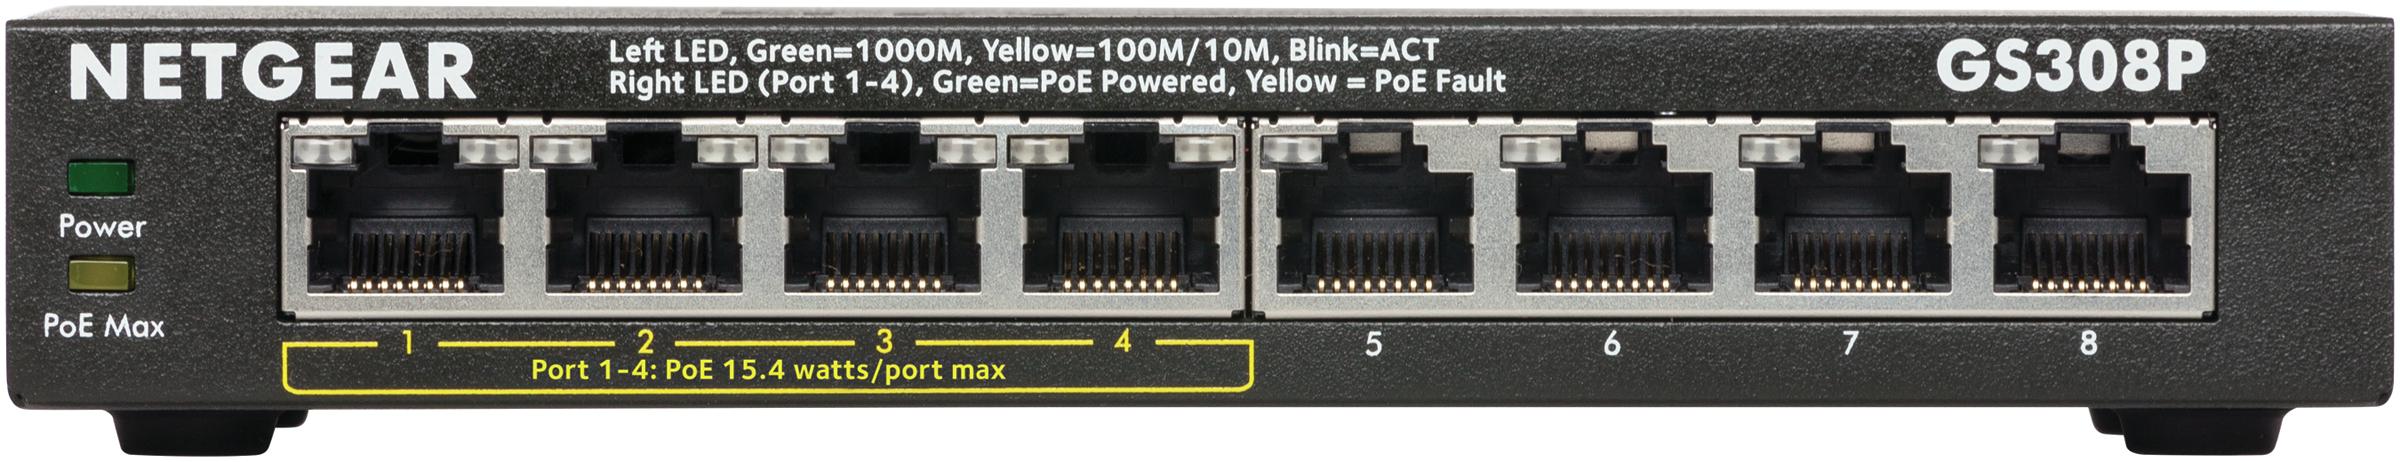 GS308P Switch (unmanaged, 4 x 10/100/1000 PoE + 4 x 10/100/1000, desktop, wall-mountable, PoE)